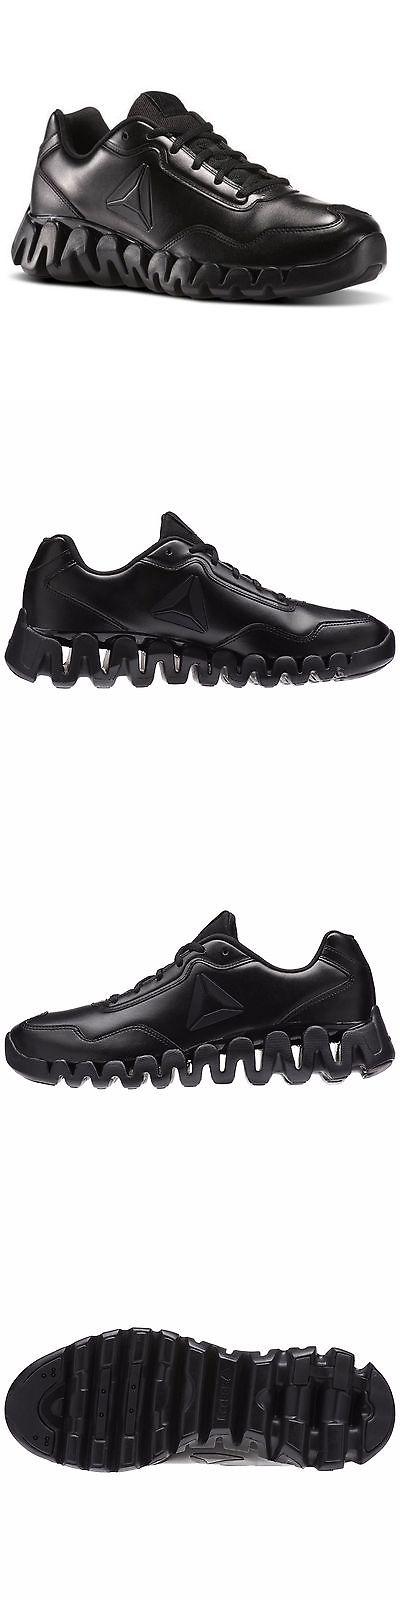 509c3da42b2 reebok zig patent leather court shoes - Hotel le Moulin Neuf